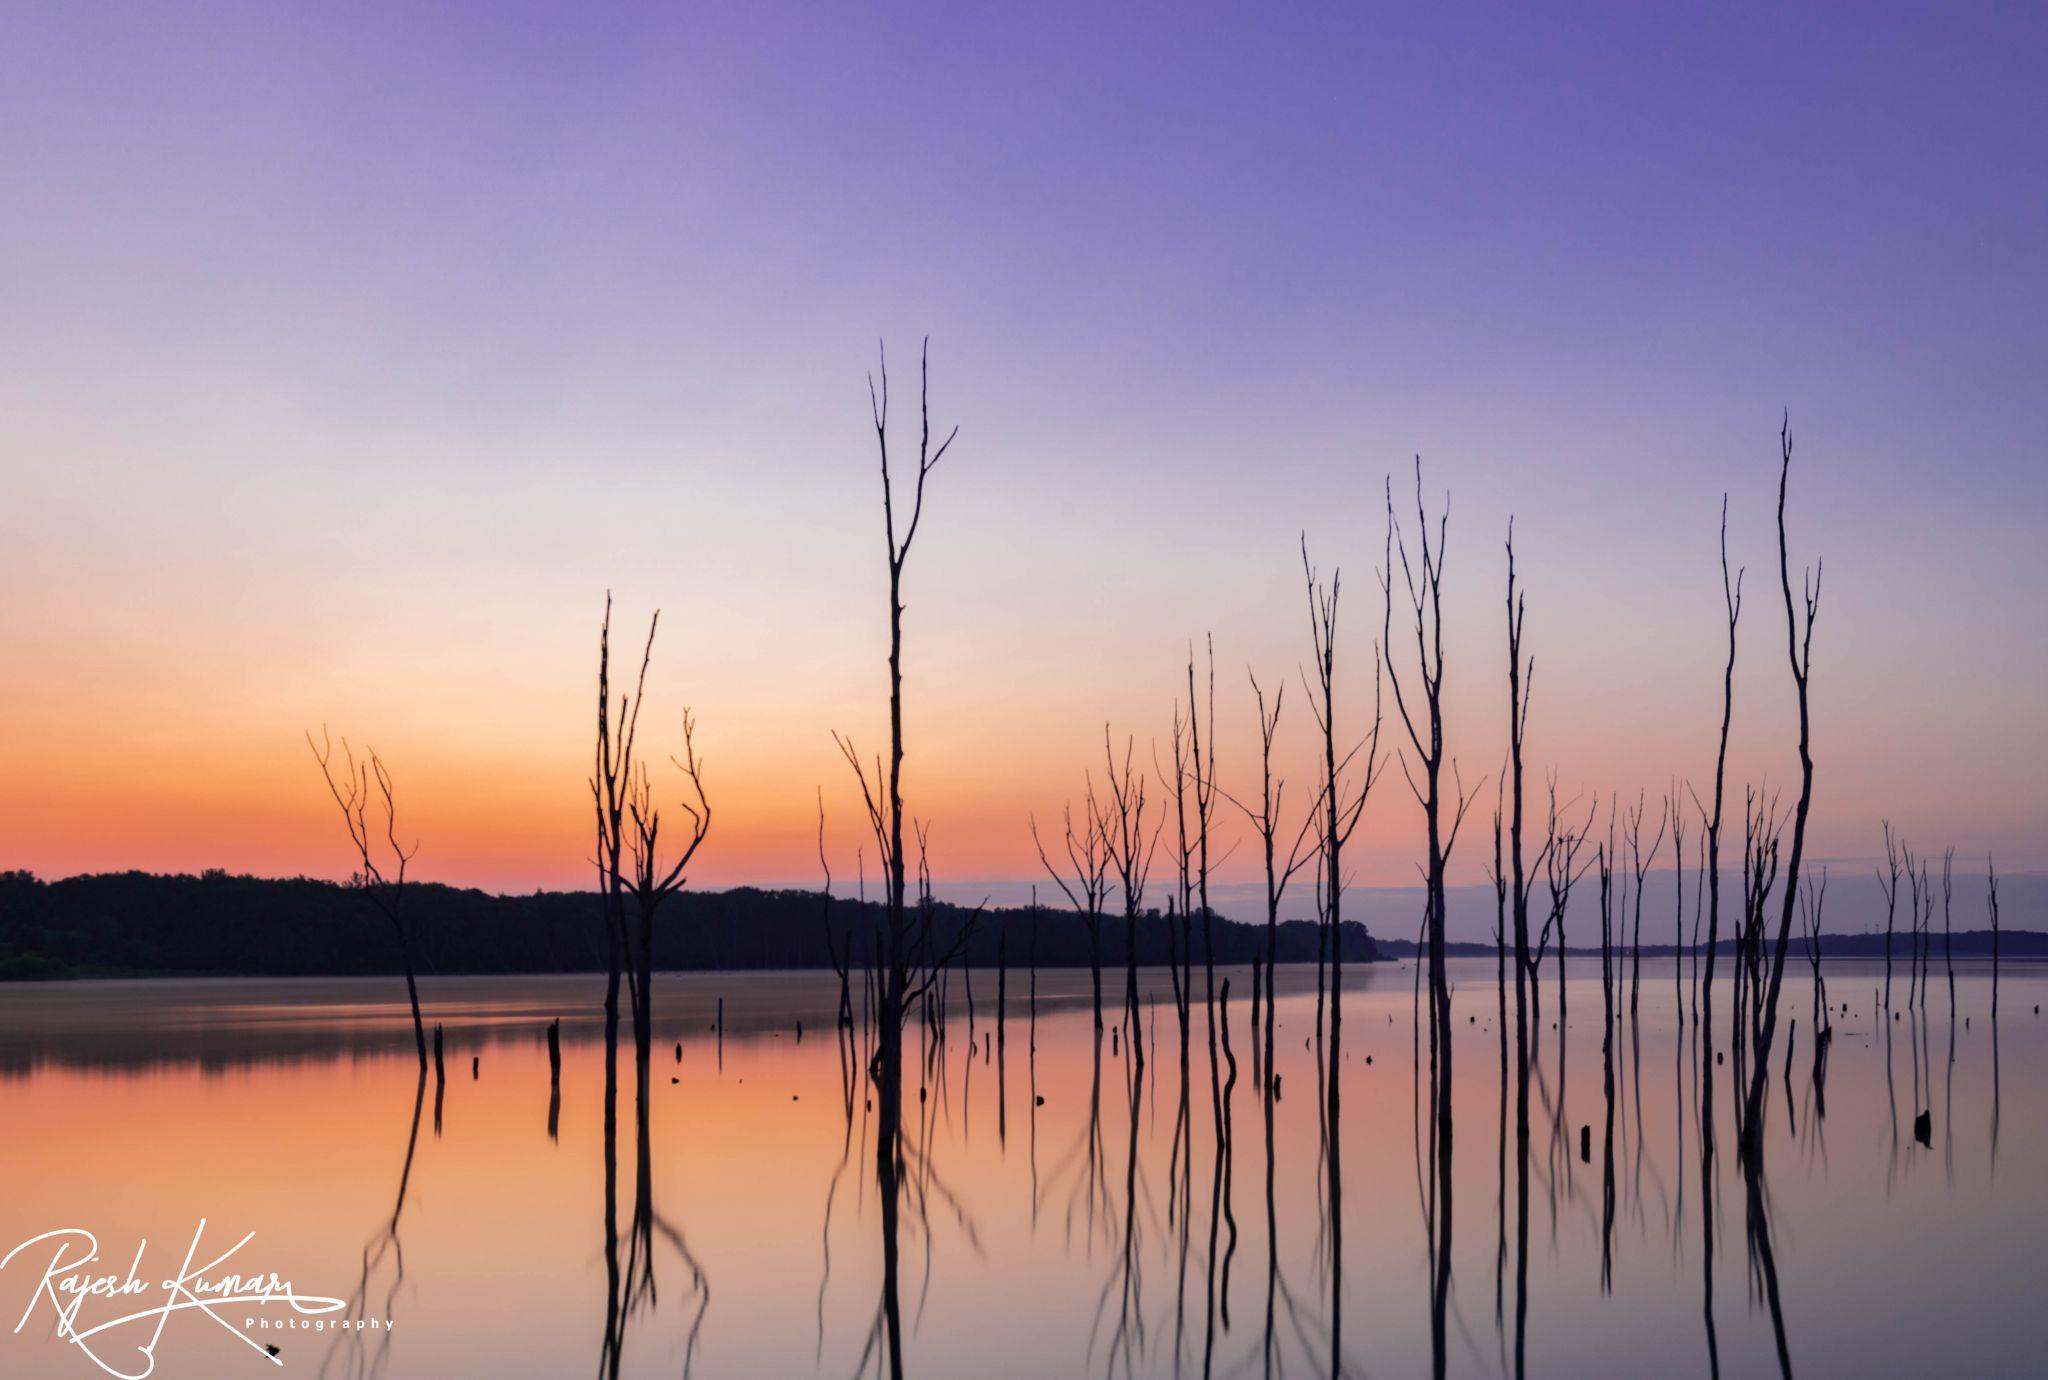 Manasquan Reservoir, NJ, USA